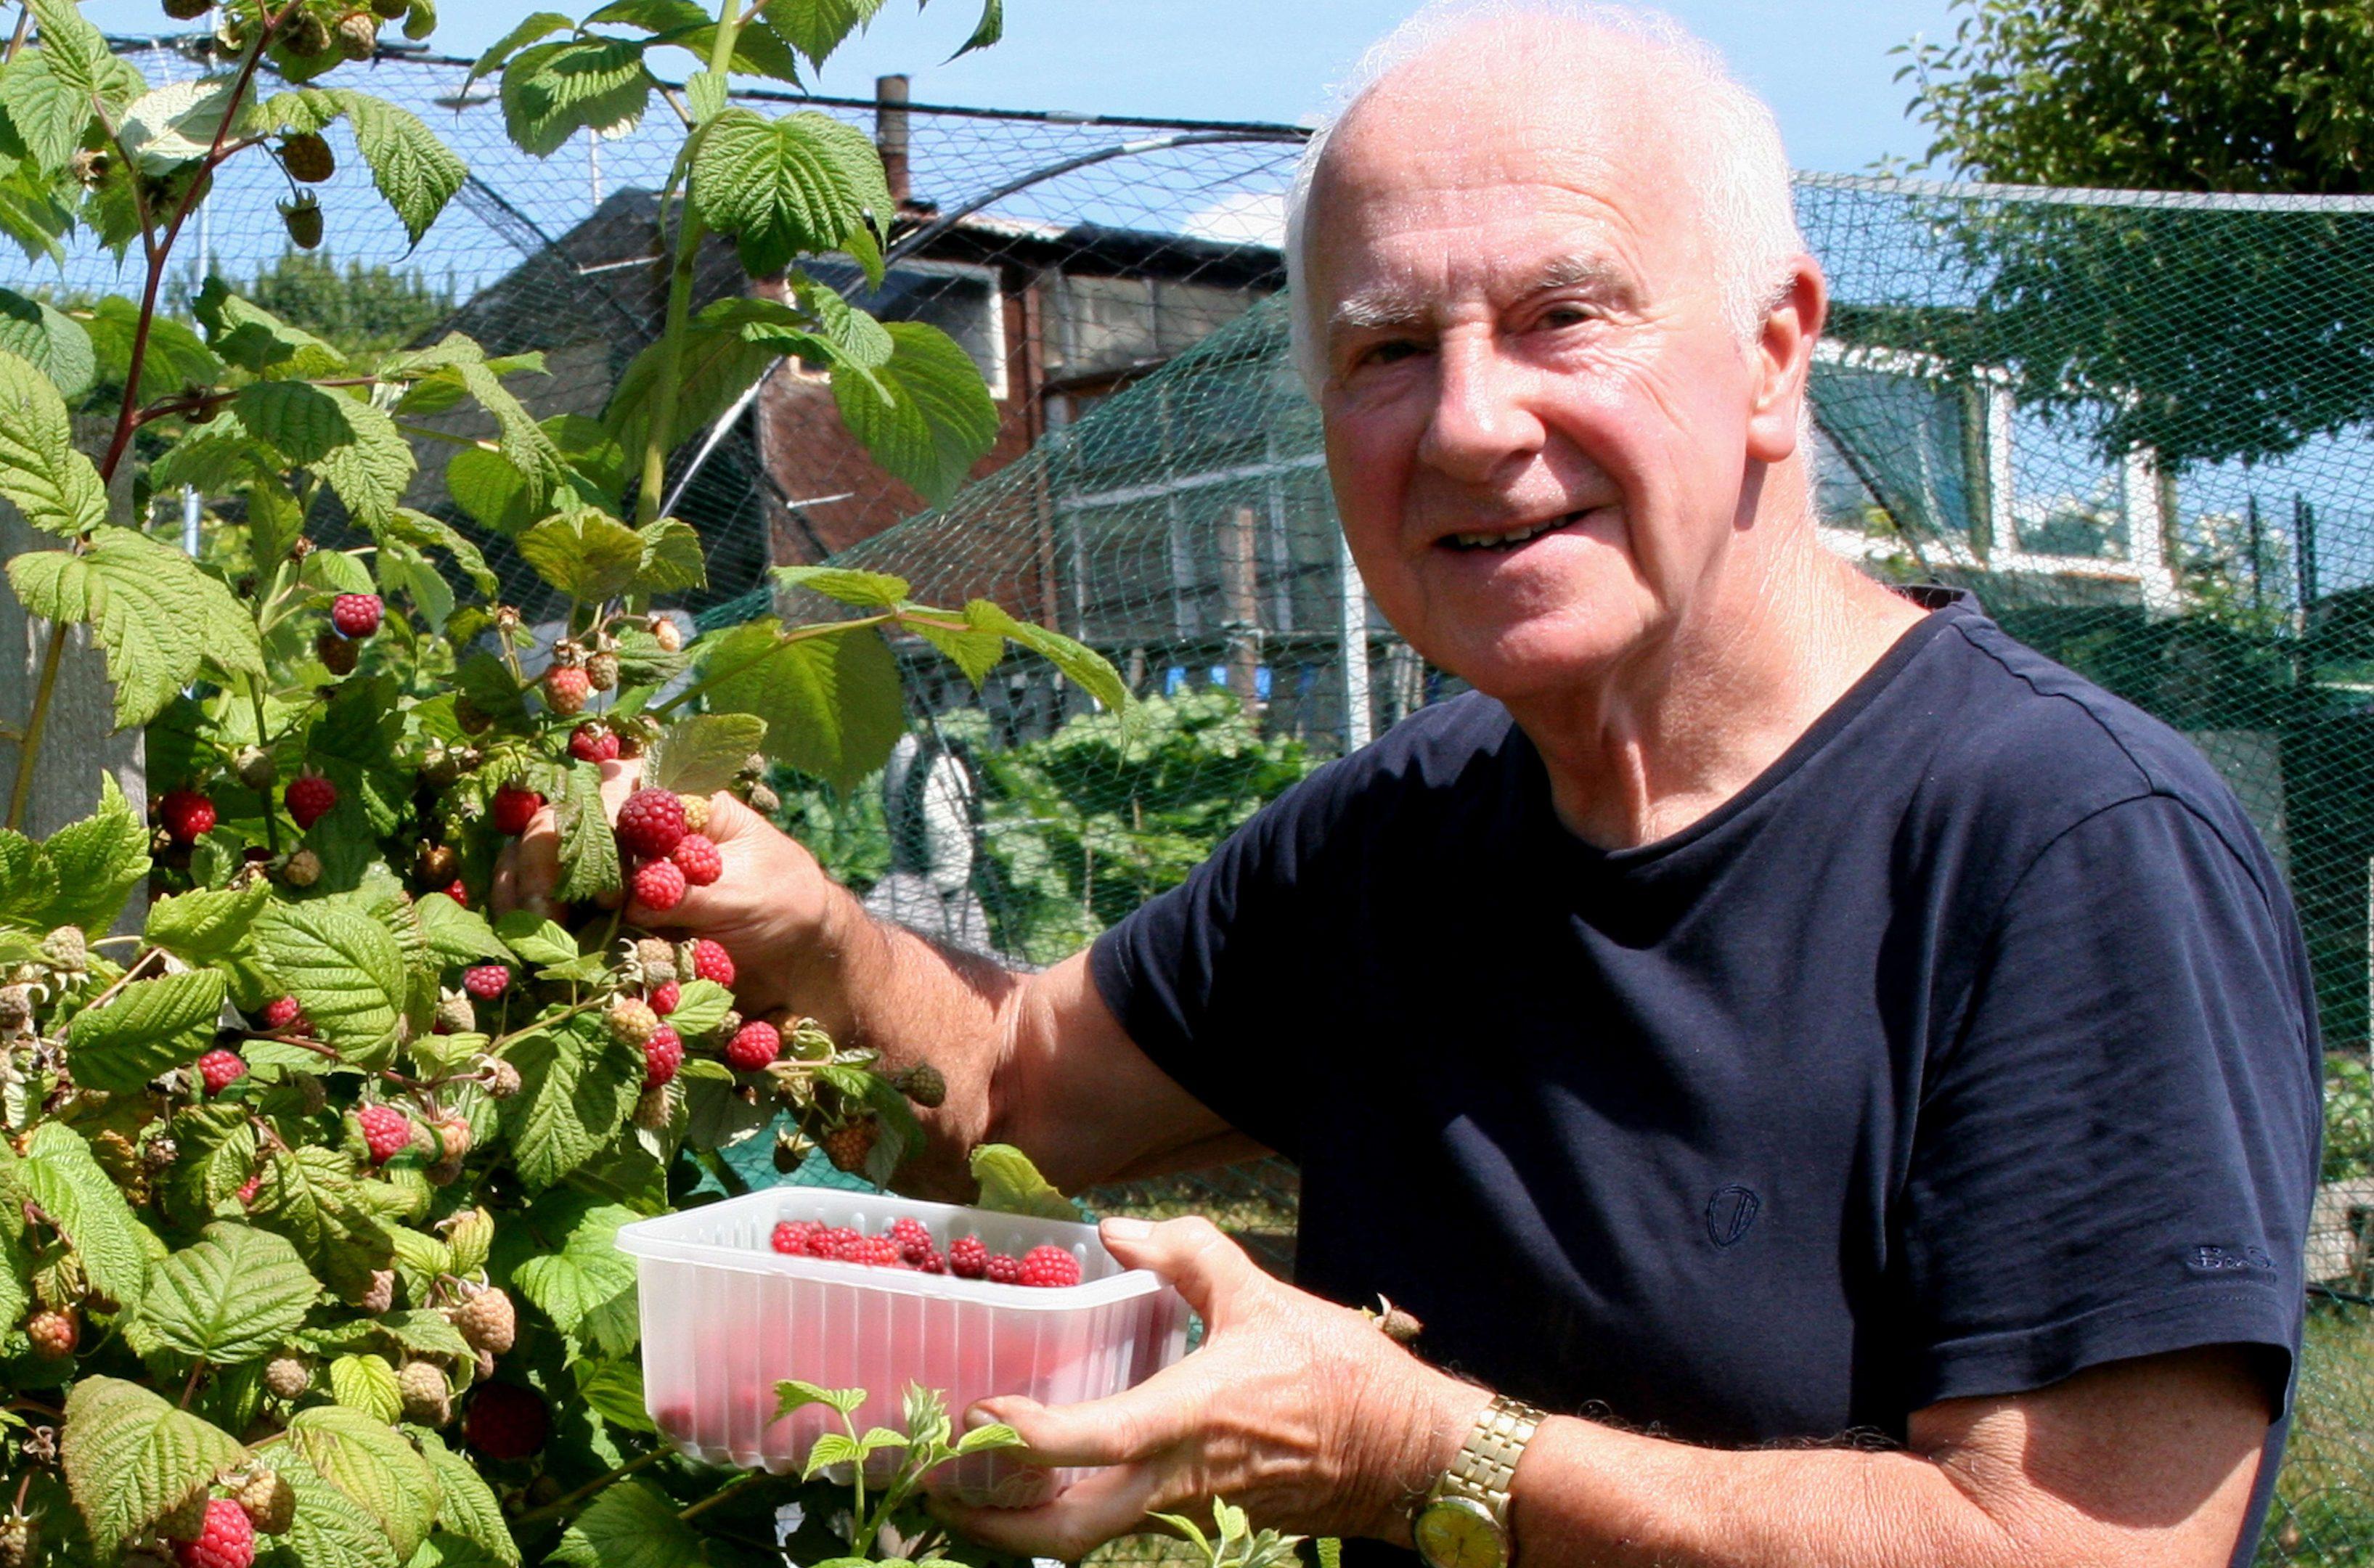 Picking a few Glen Fyne raspberries